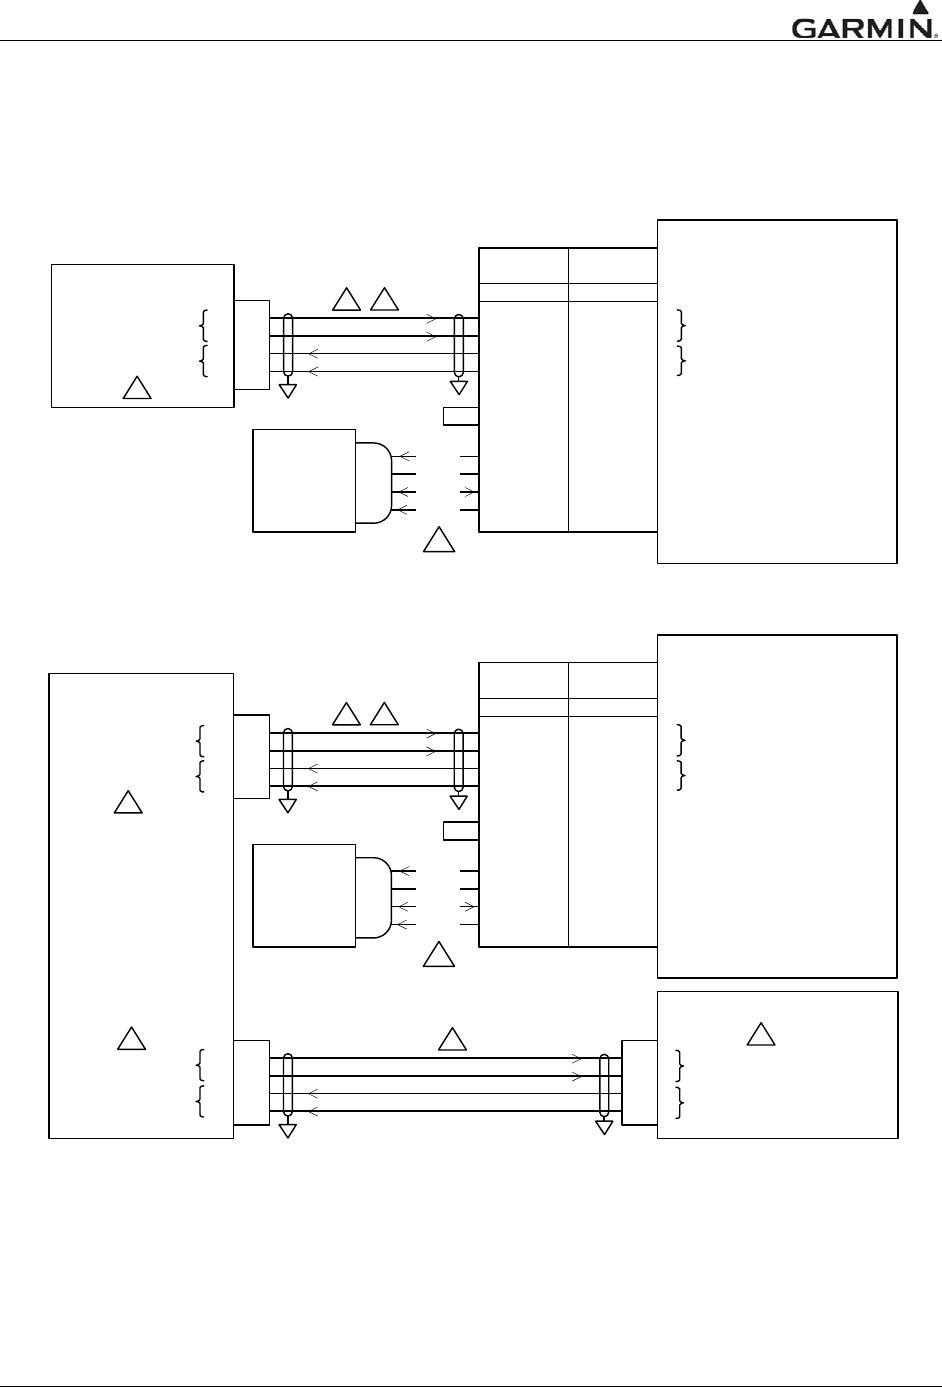 Handleiding Garmin Gtn 725 Pagina 337 Van 412 English 232 Wiring Diagram